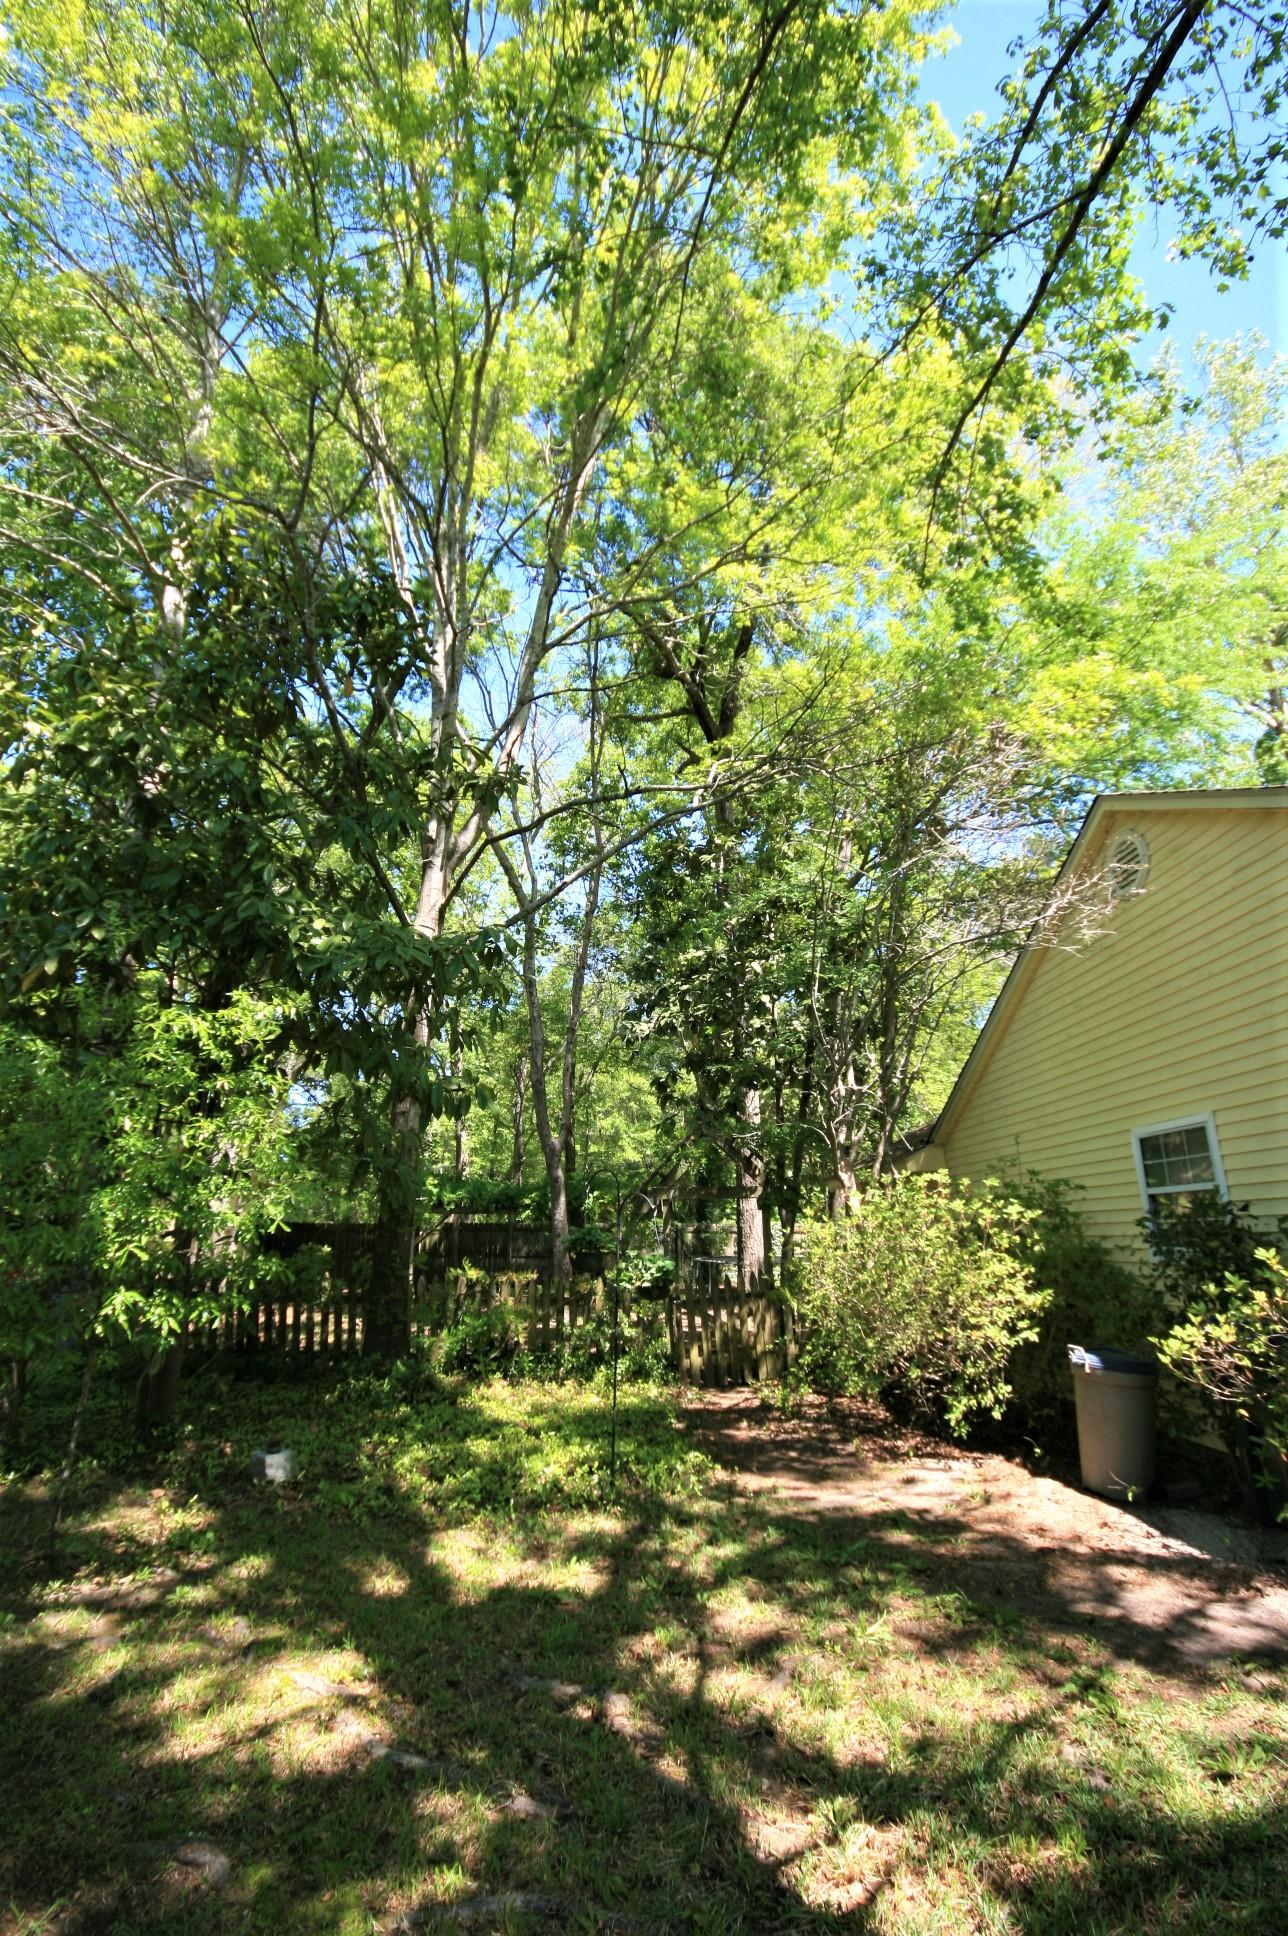 Crichton Parish Homes For Sale - 110 Ruston, Summerville, SC - 2